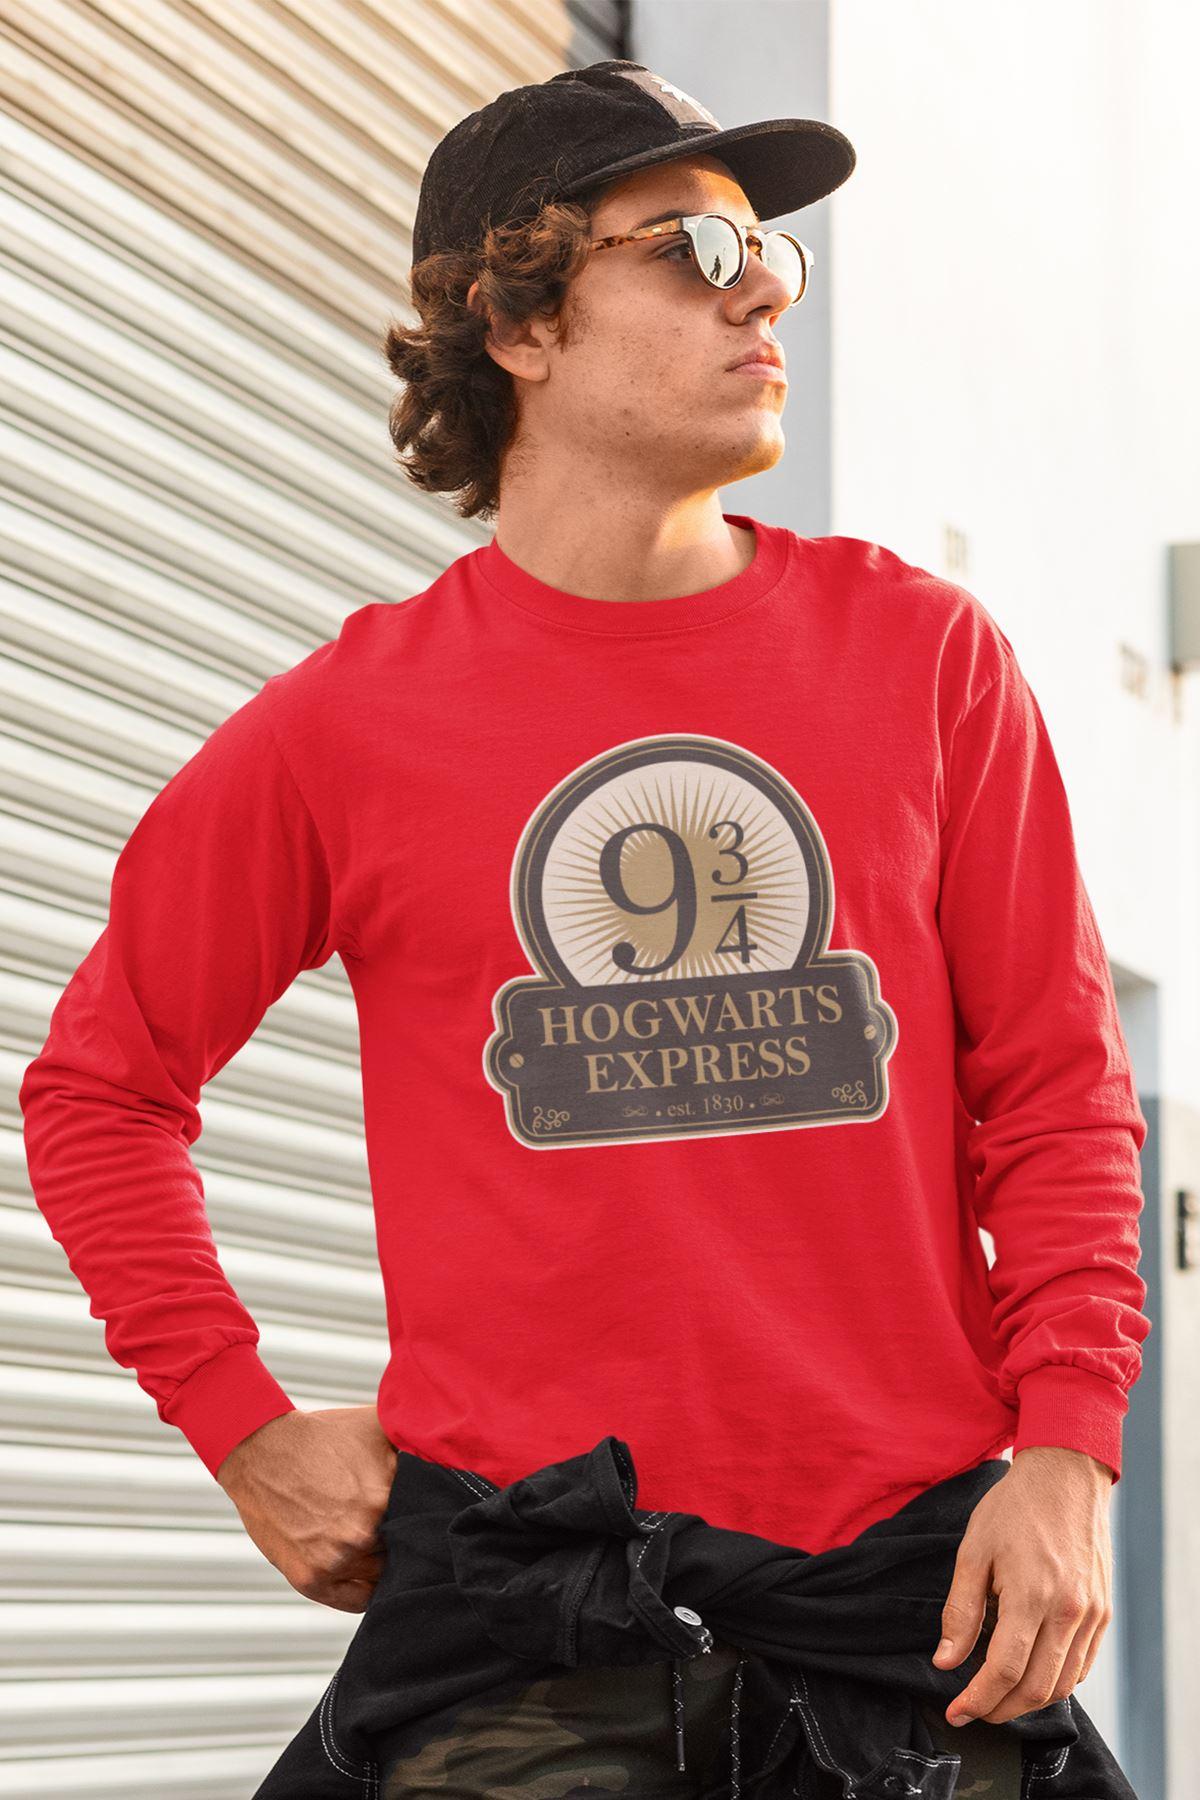 Harry Potter 61 Kırmızı Sweatshirt